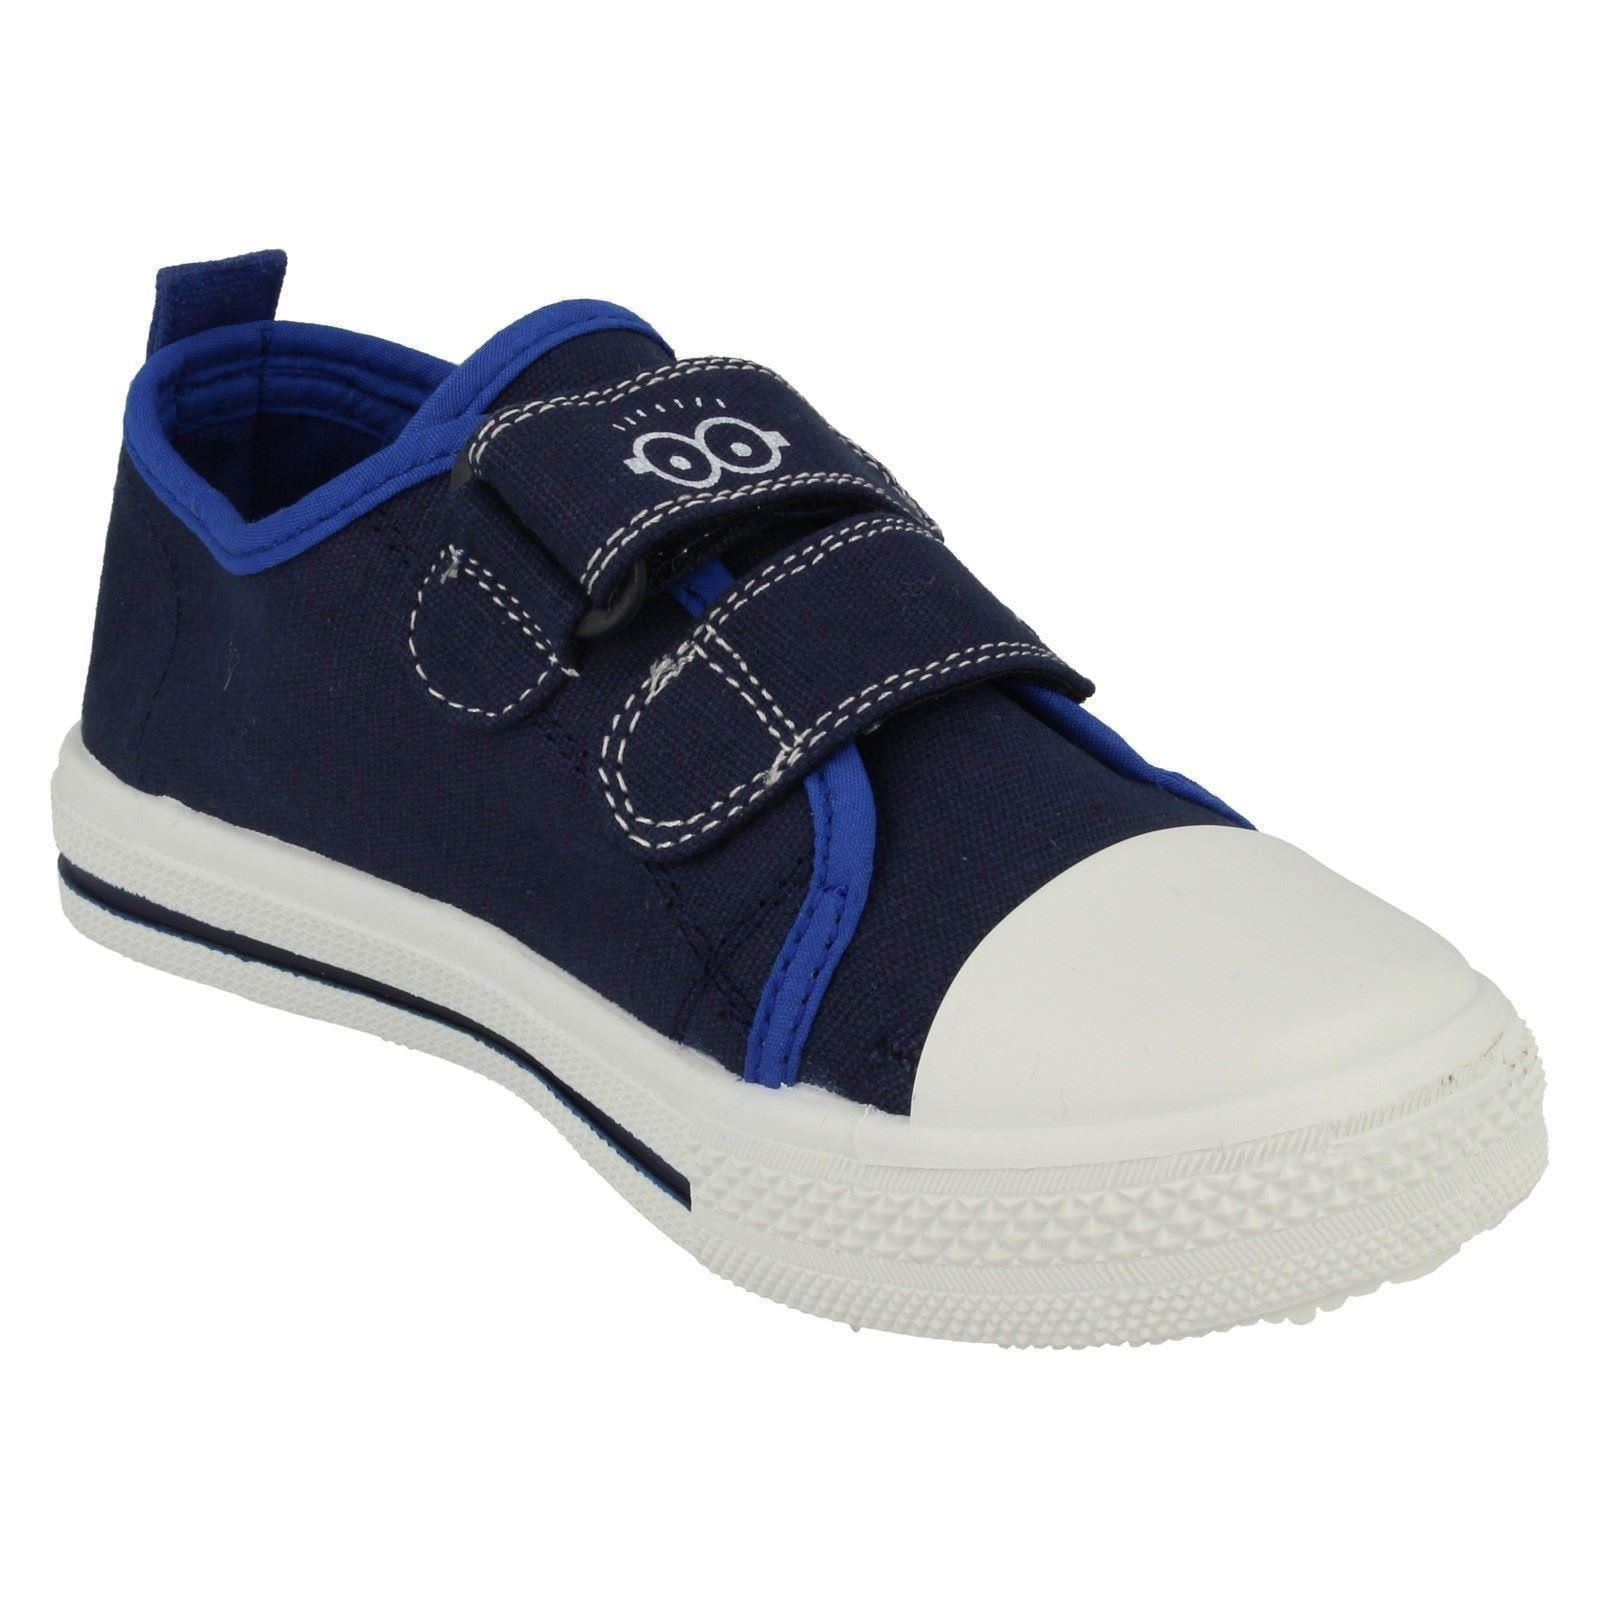 Zapatillas lona niños Minion Etiqueta ronskley bajo